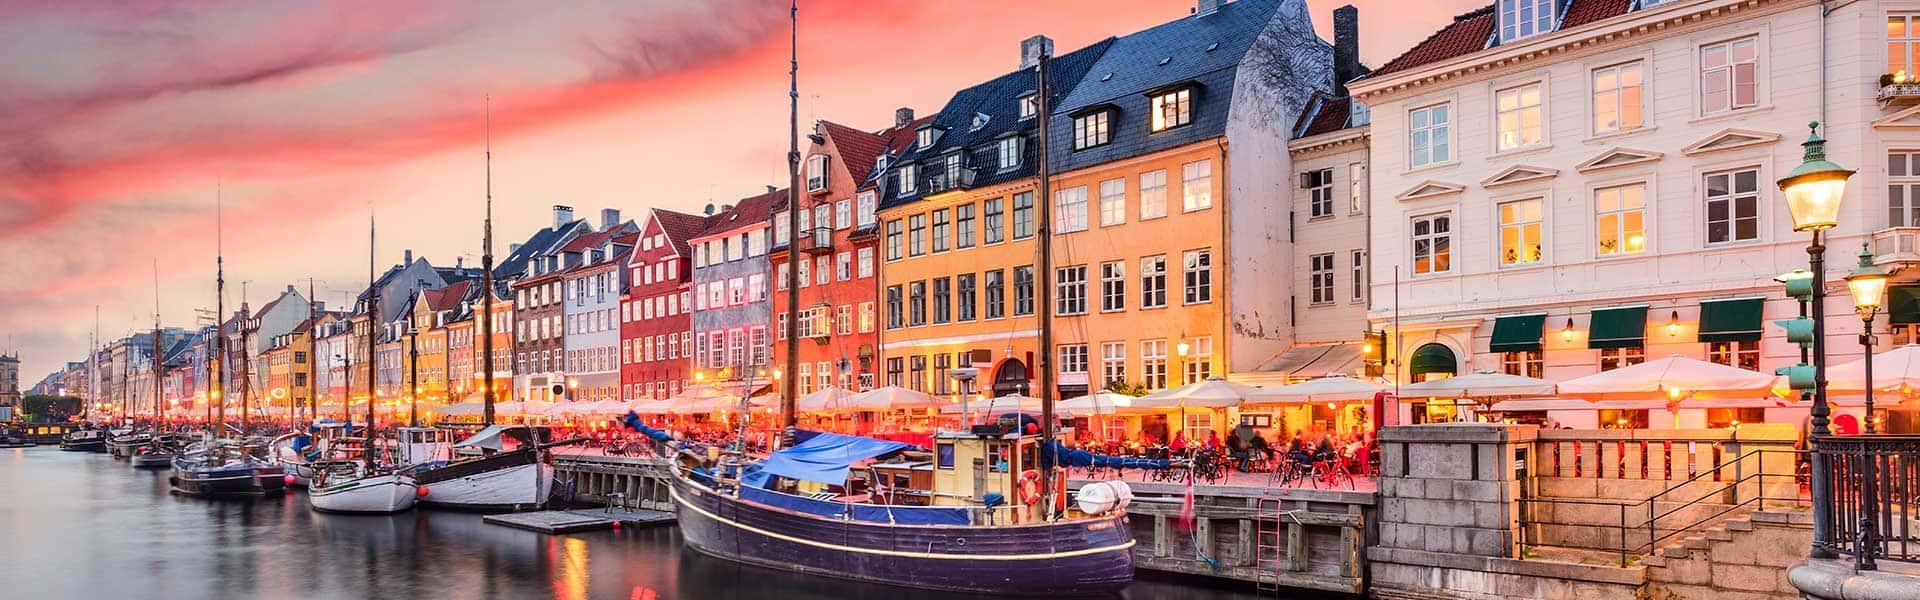 Willkommen in Nyhavn, in der Stadt Kopenhagen, Dänemark